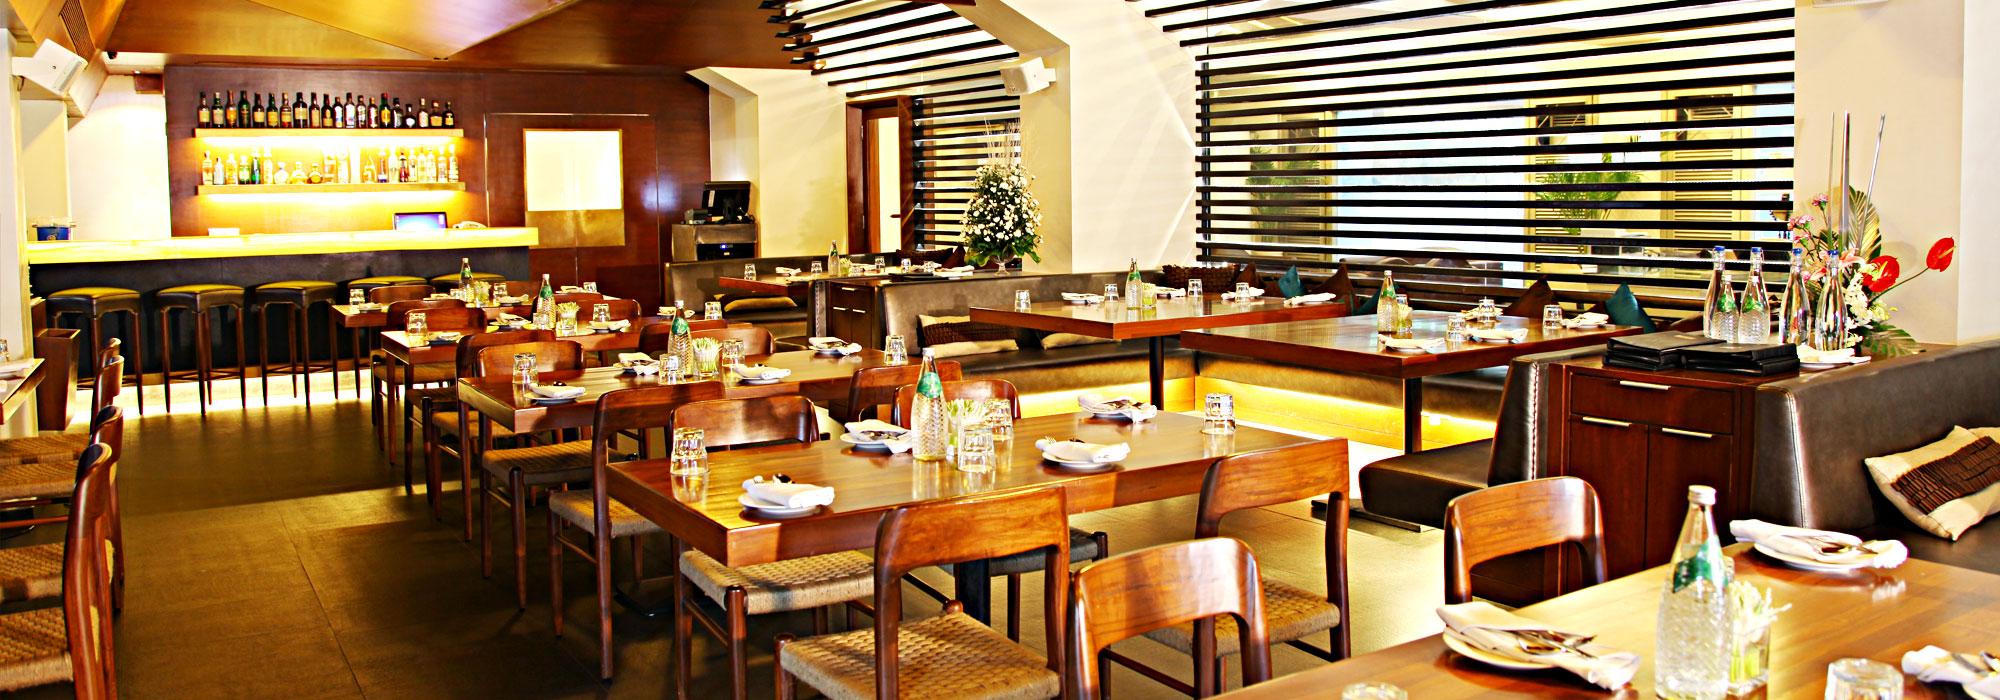 Royal garden hotel Juhu Hotel mumbai, 4 Star Hotel in Juhu Beach Mumbai